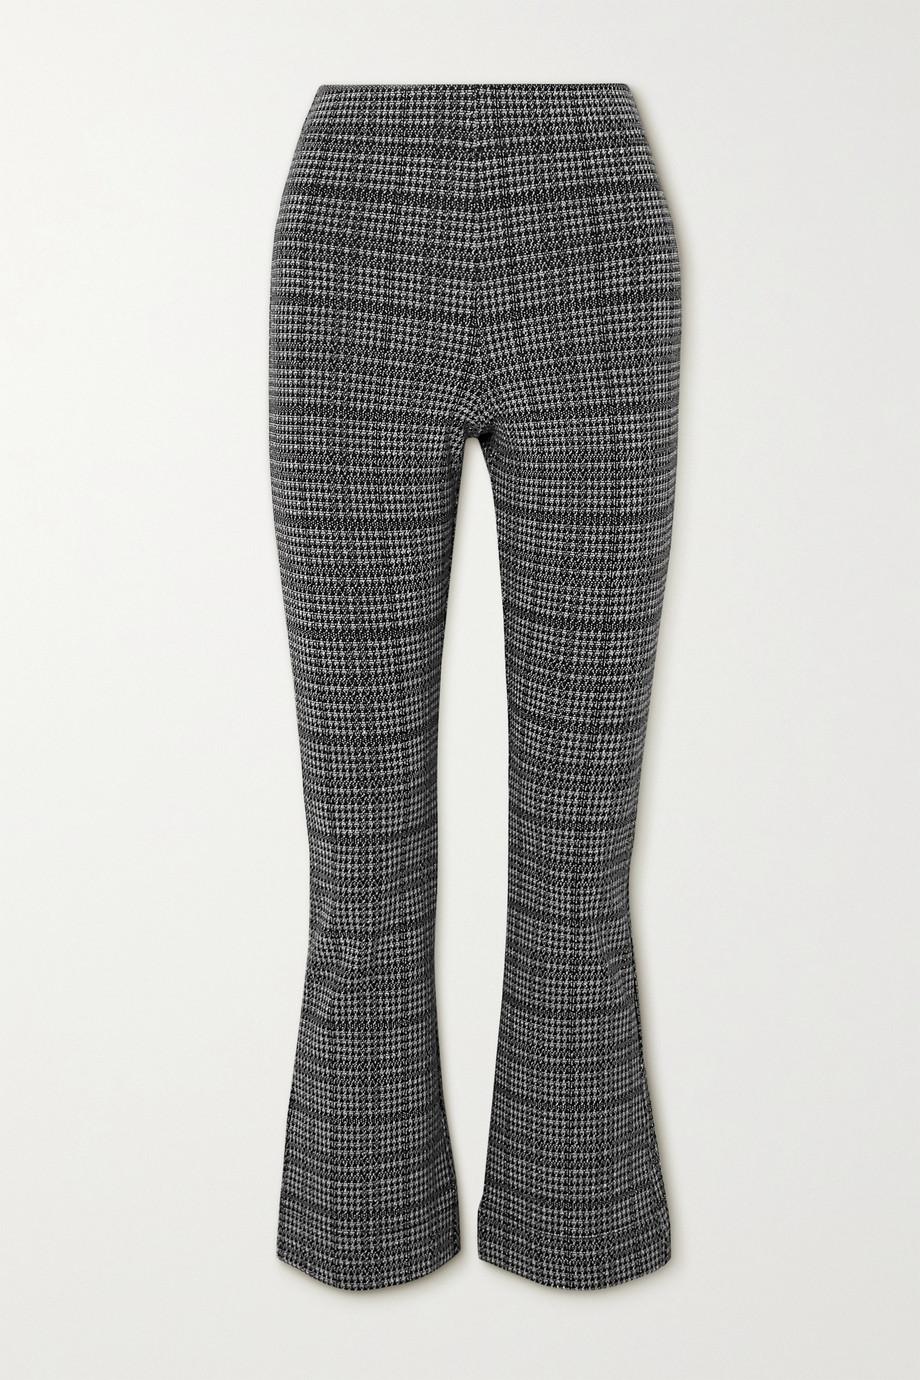 LESET Stili 威尔士亲王格纹梭织九分喇叭裤